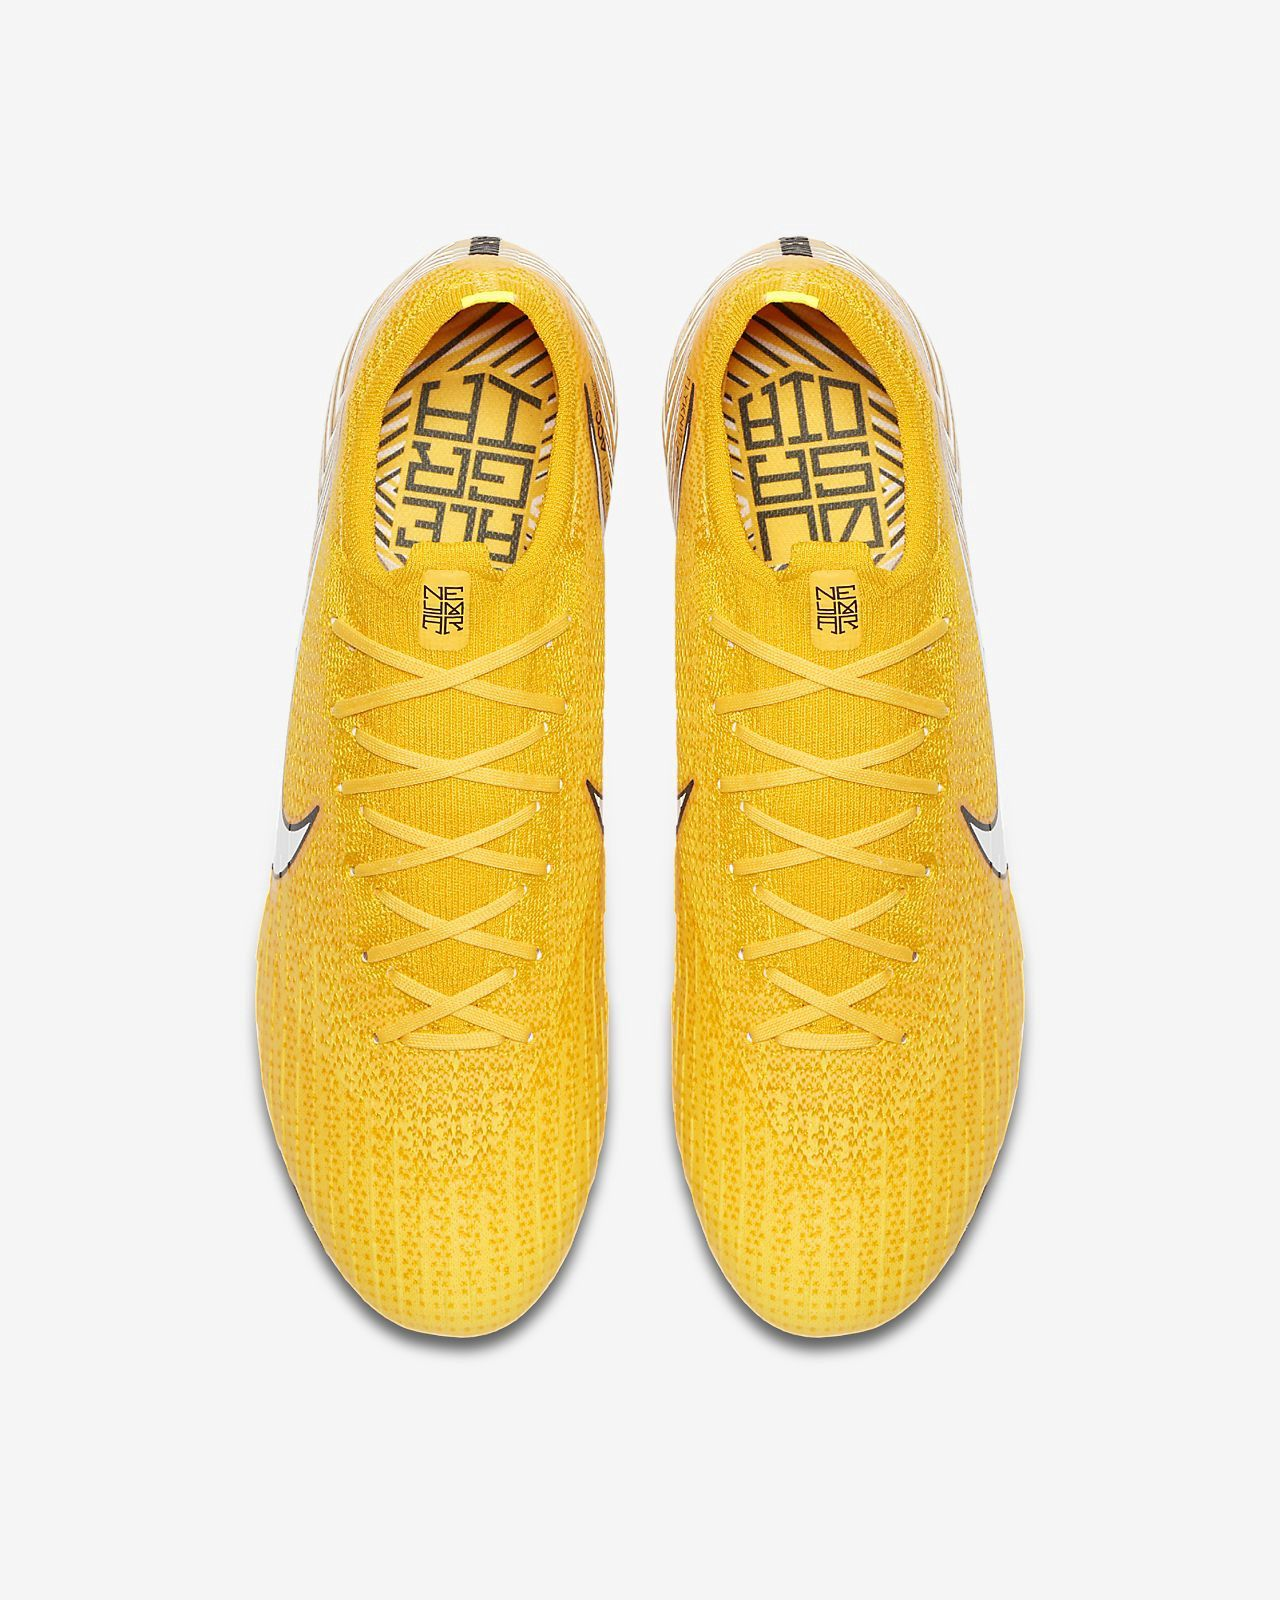 0bbd870504 Nike Mercurial Vapor 360 Elite Neymar Jr Fg Firm-Ground Soccer Cleat - M 12  / W 13.5